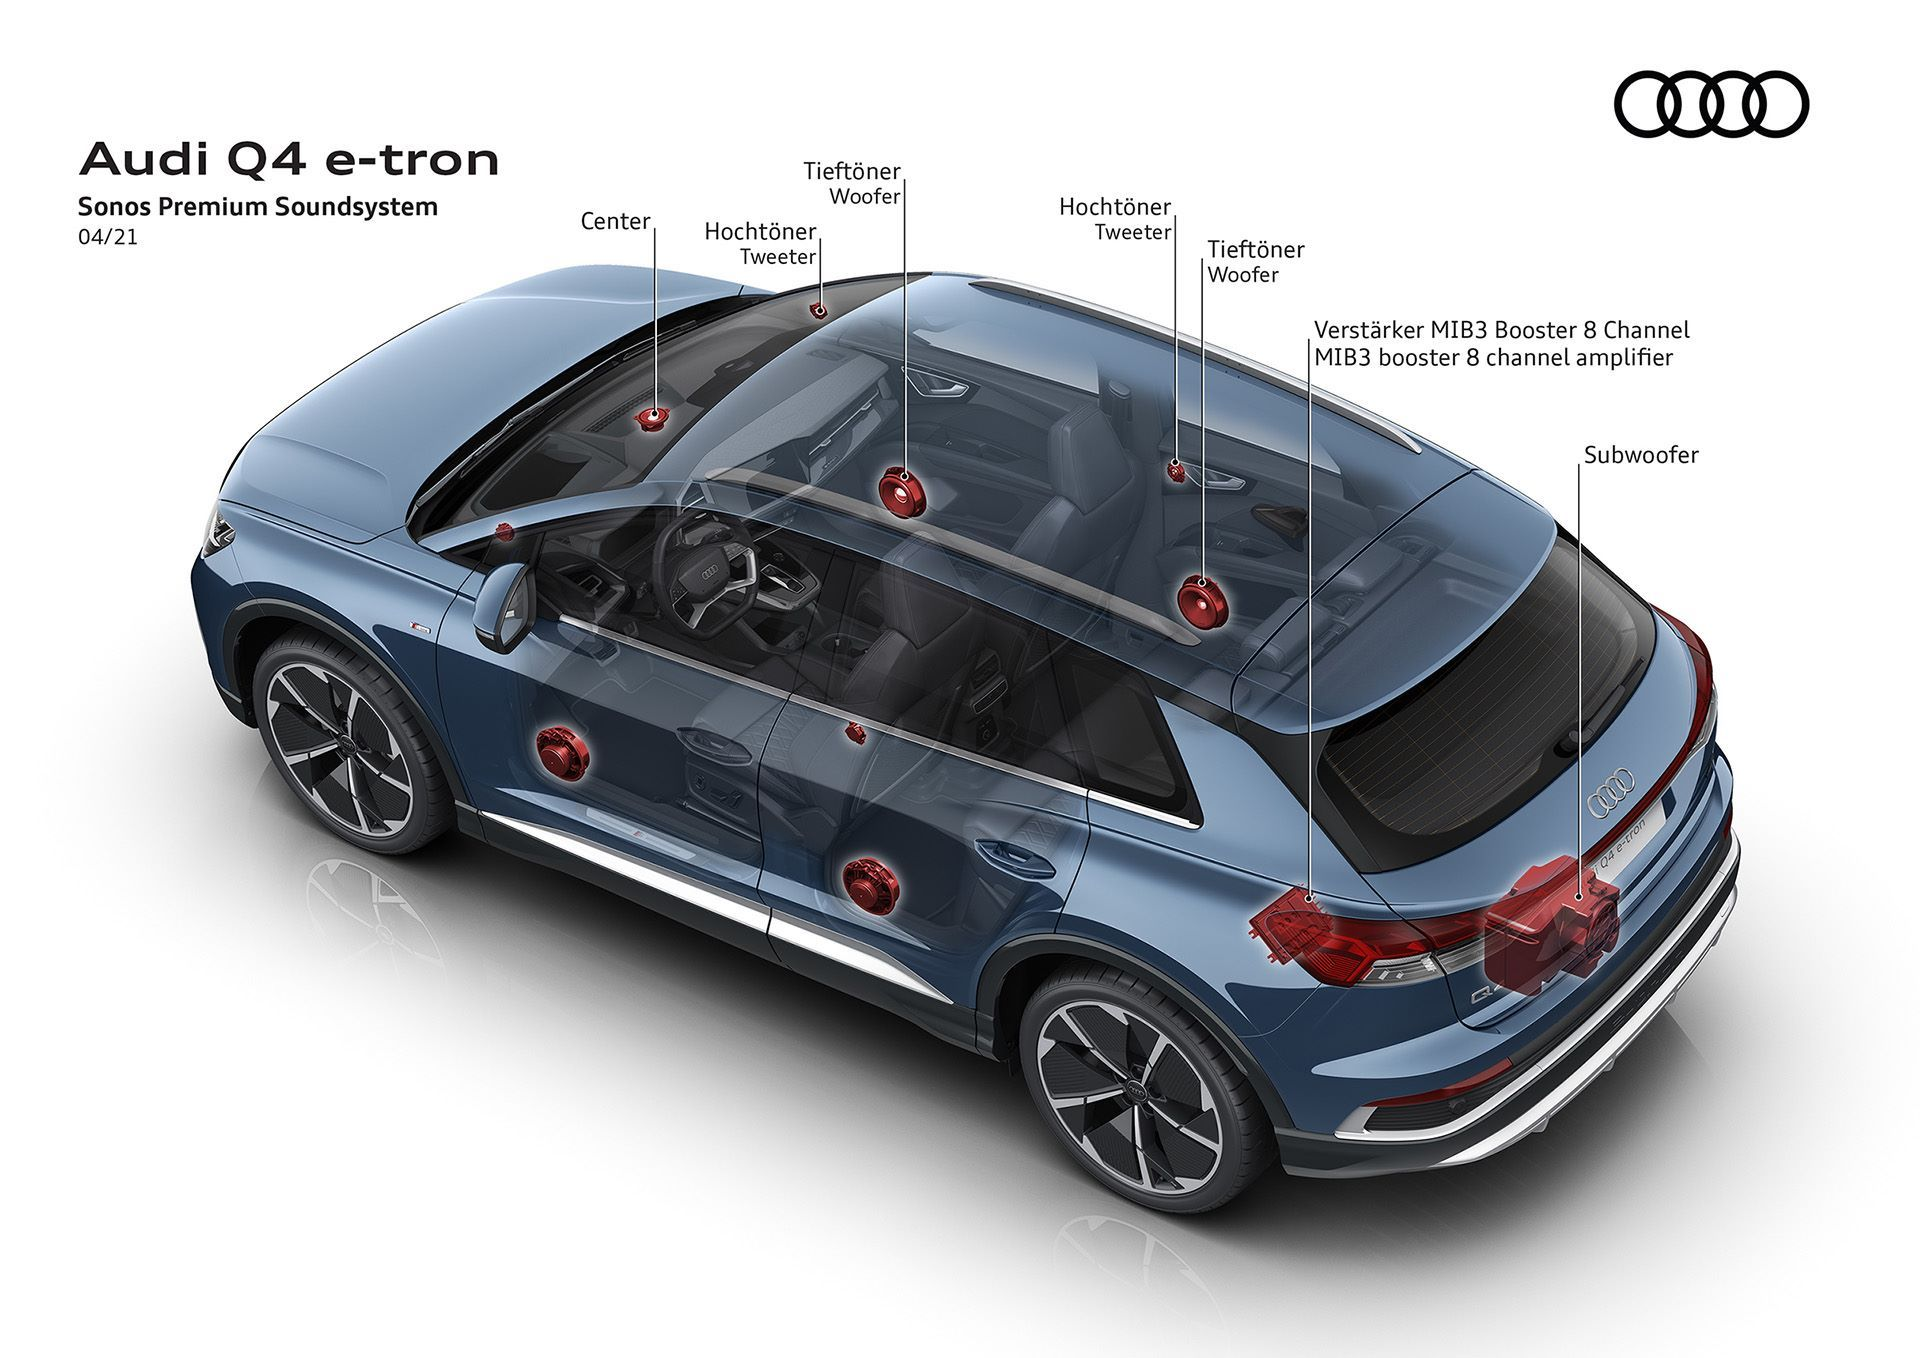 Audi-Q4-e-tron-and-Q4-e-tron-Sportback-166